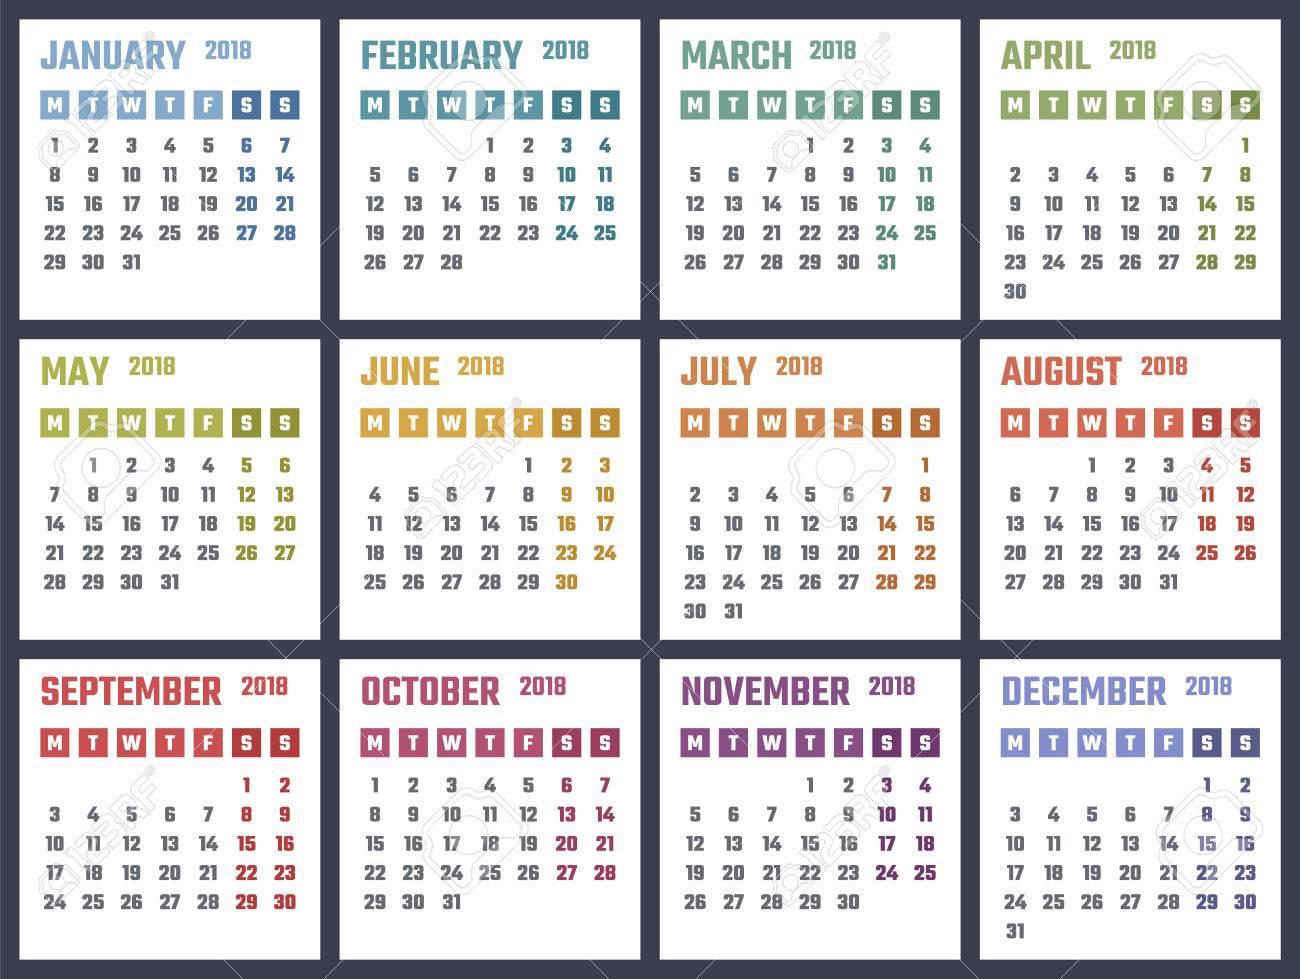 12 year calendar